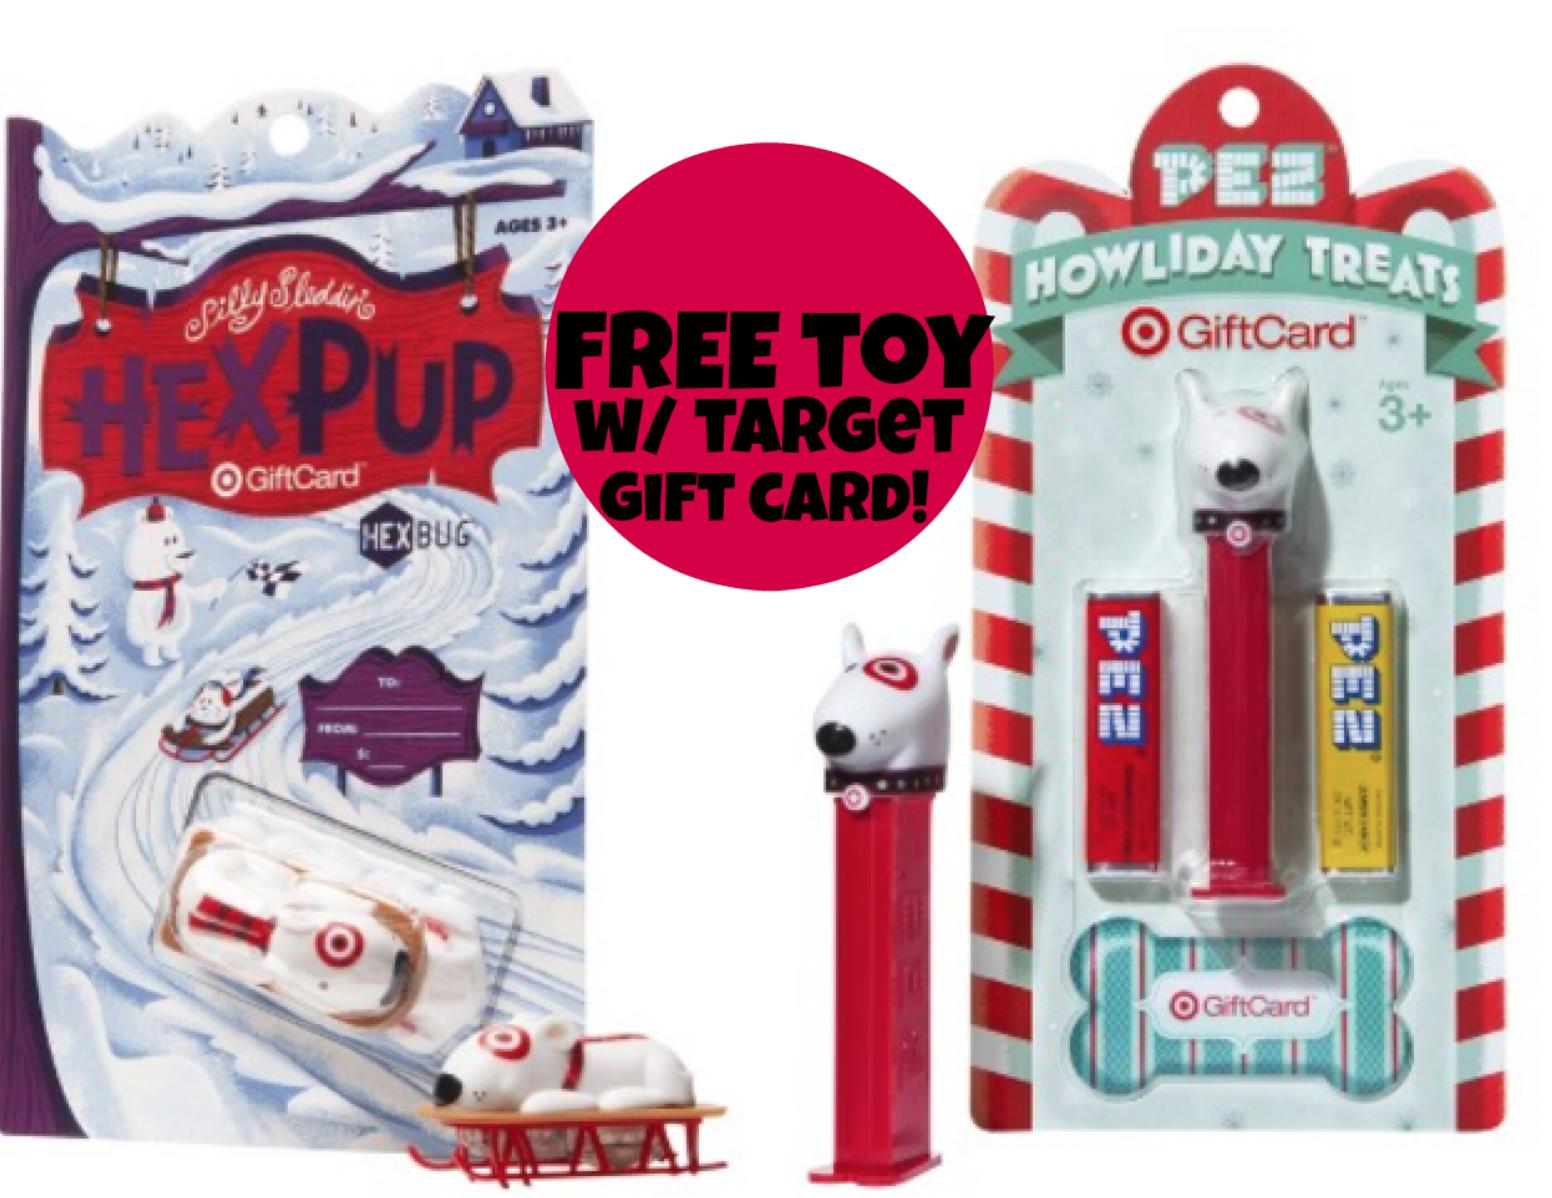 http://www.thebinderladies.com/2014/11/targetcom-free-toy-hex-pup-or-pez.html#.VGrP2IfduyM